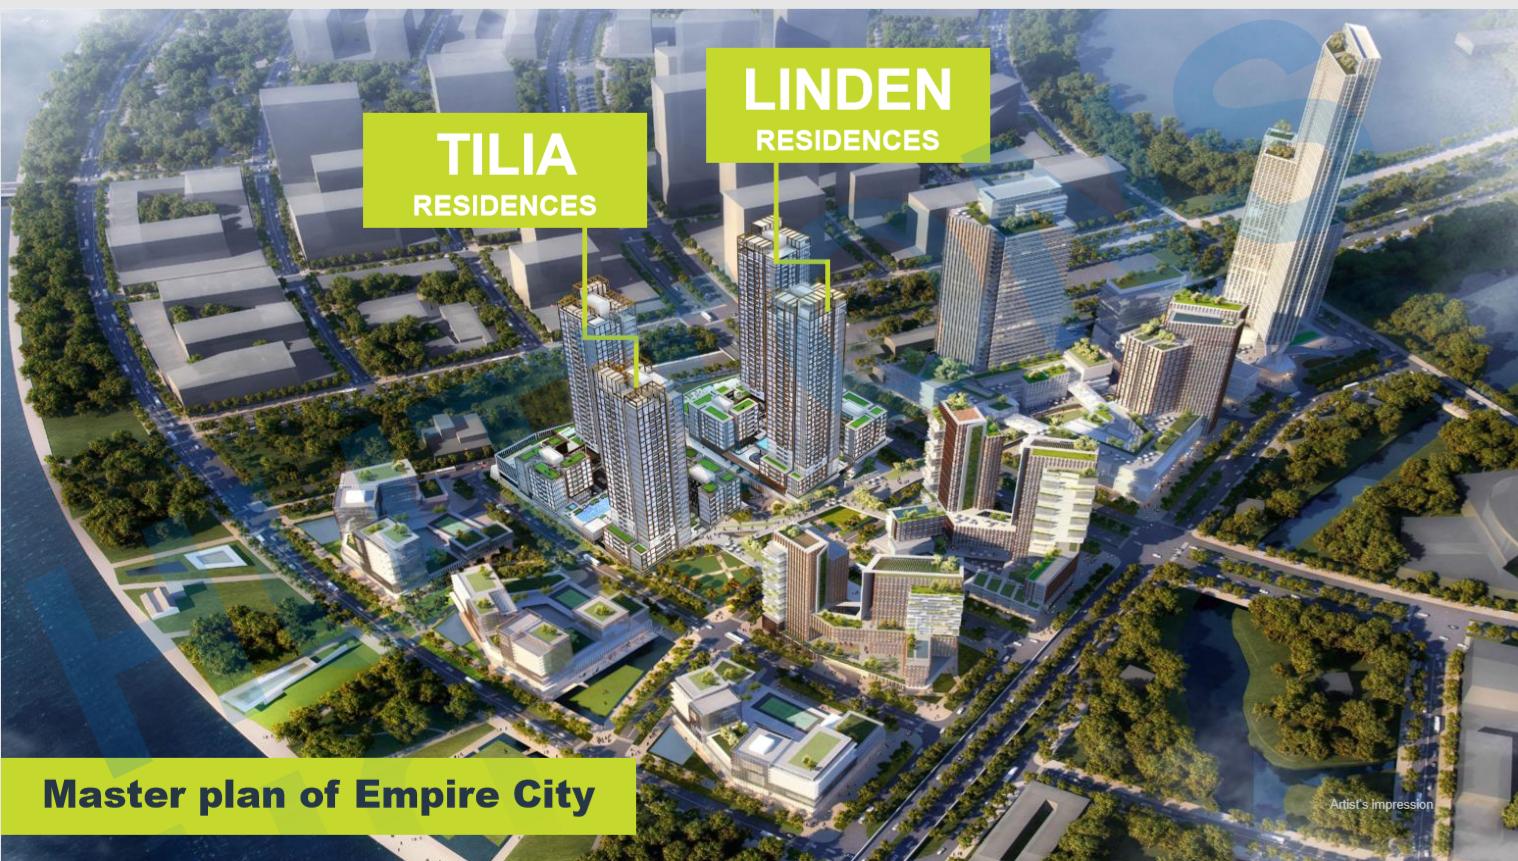 Vị trí tháp Tilia Residences - Empire City